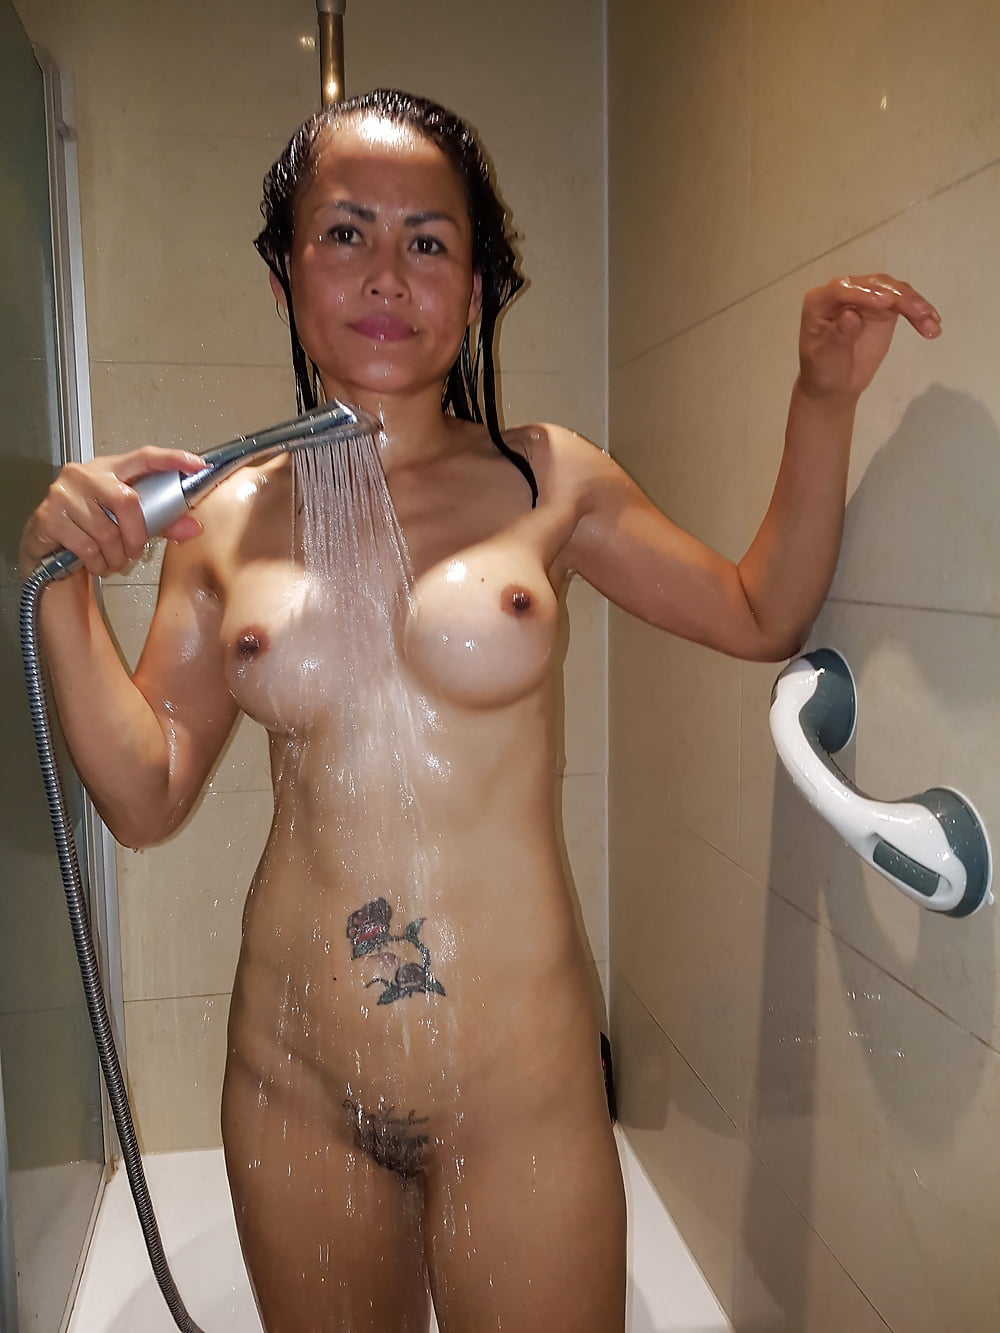 Naked shower friend - prank - fun